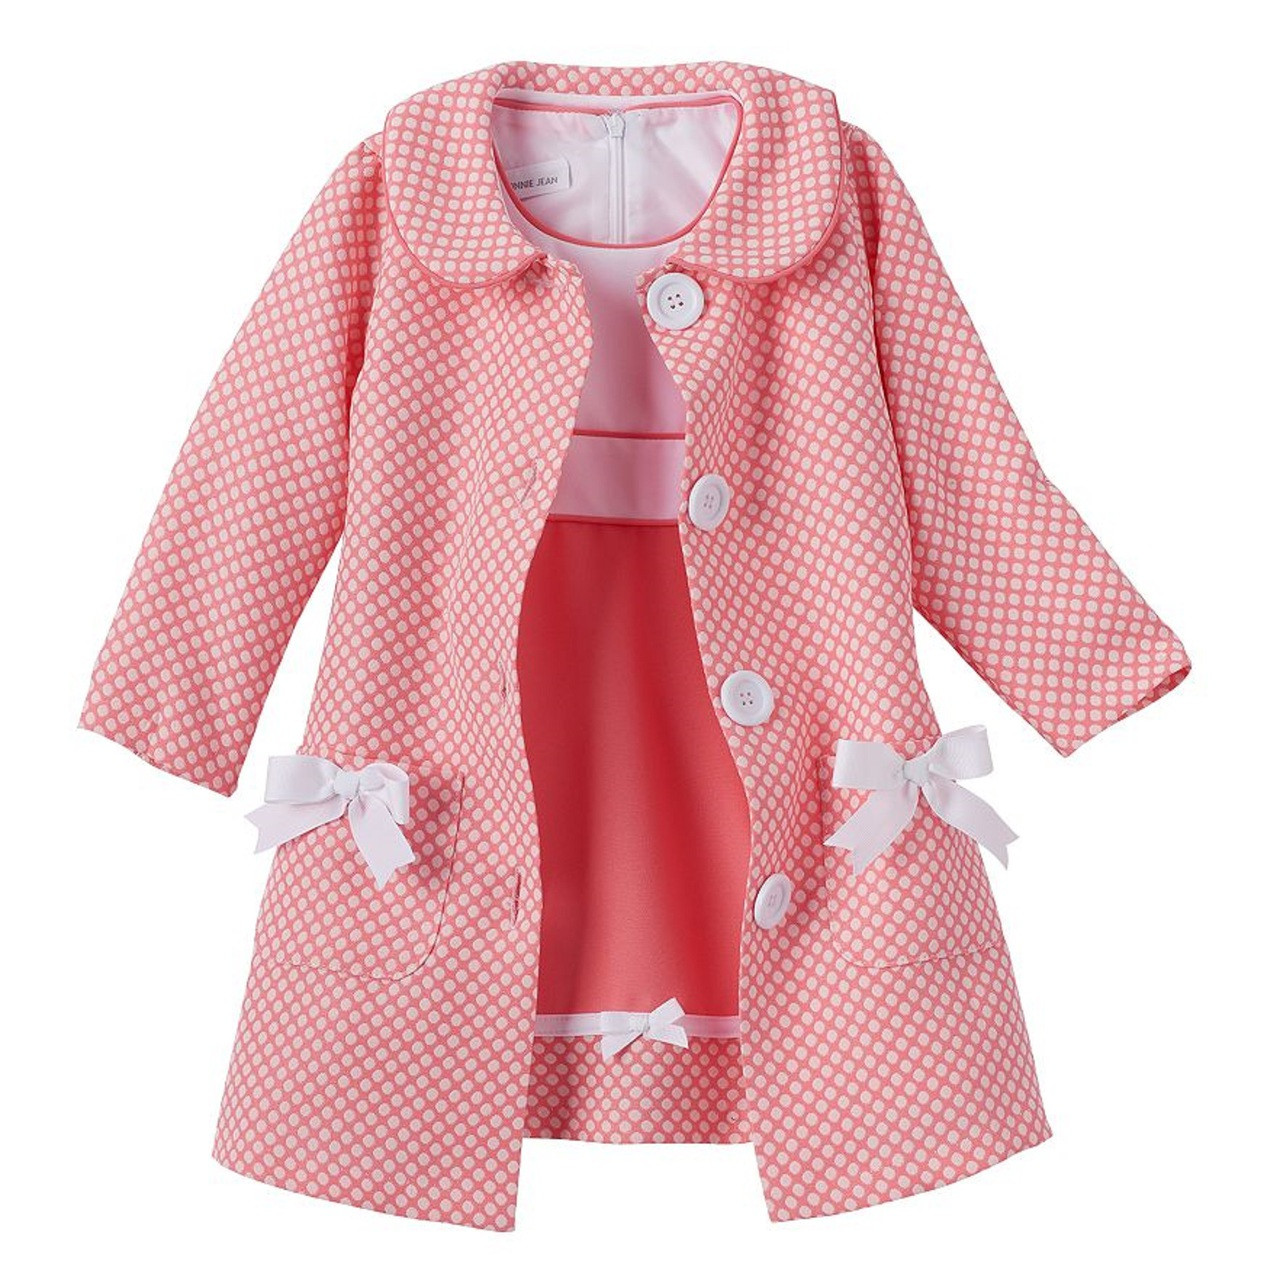 7fbdcb4f66e Bonnie Jean Little Girls Coral Easter Holiday Bow Polka Coat Dress Set 2T -  6X